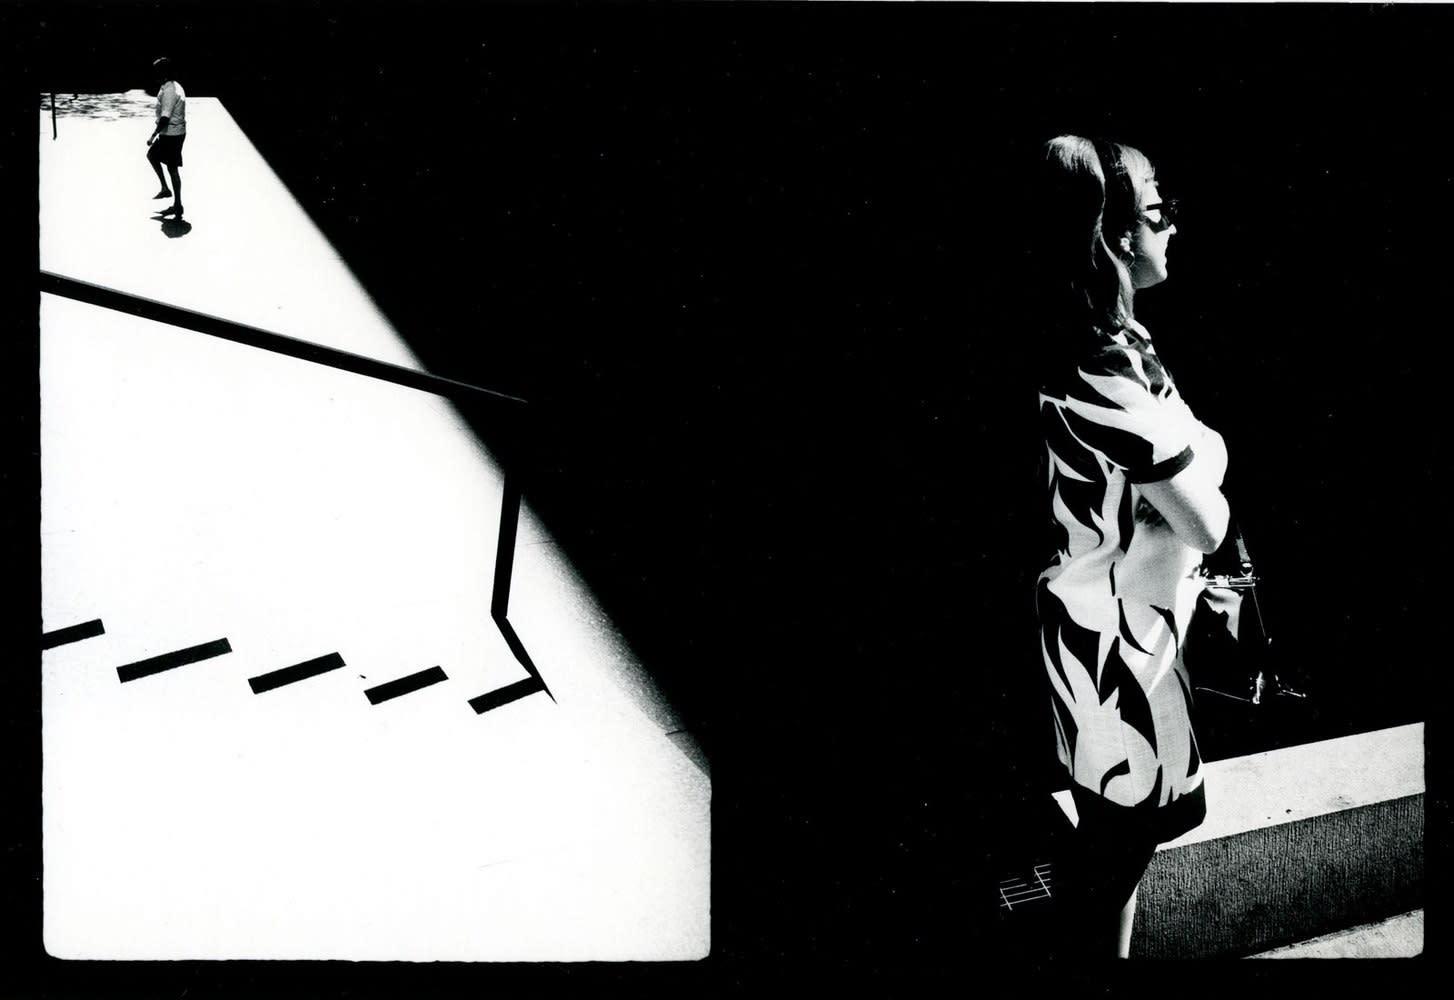 Ray K. Metzker, Couplets, New York, 1968